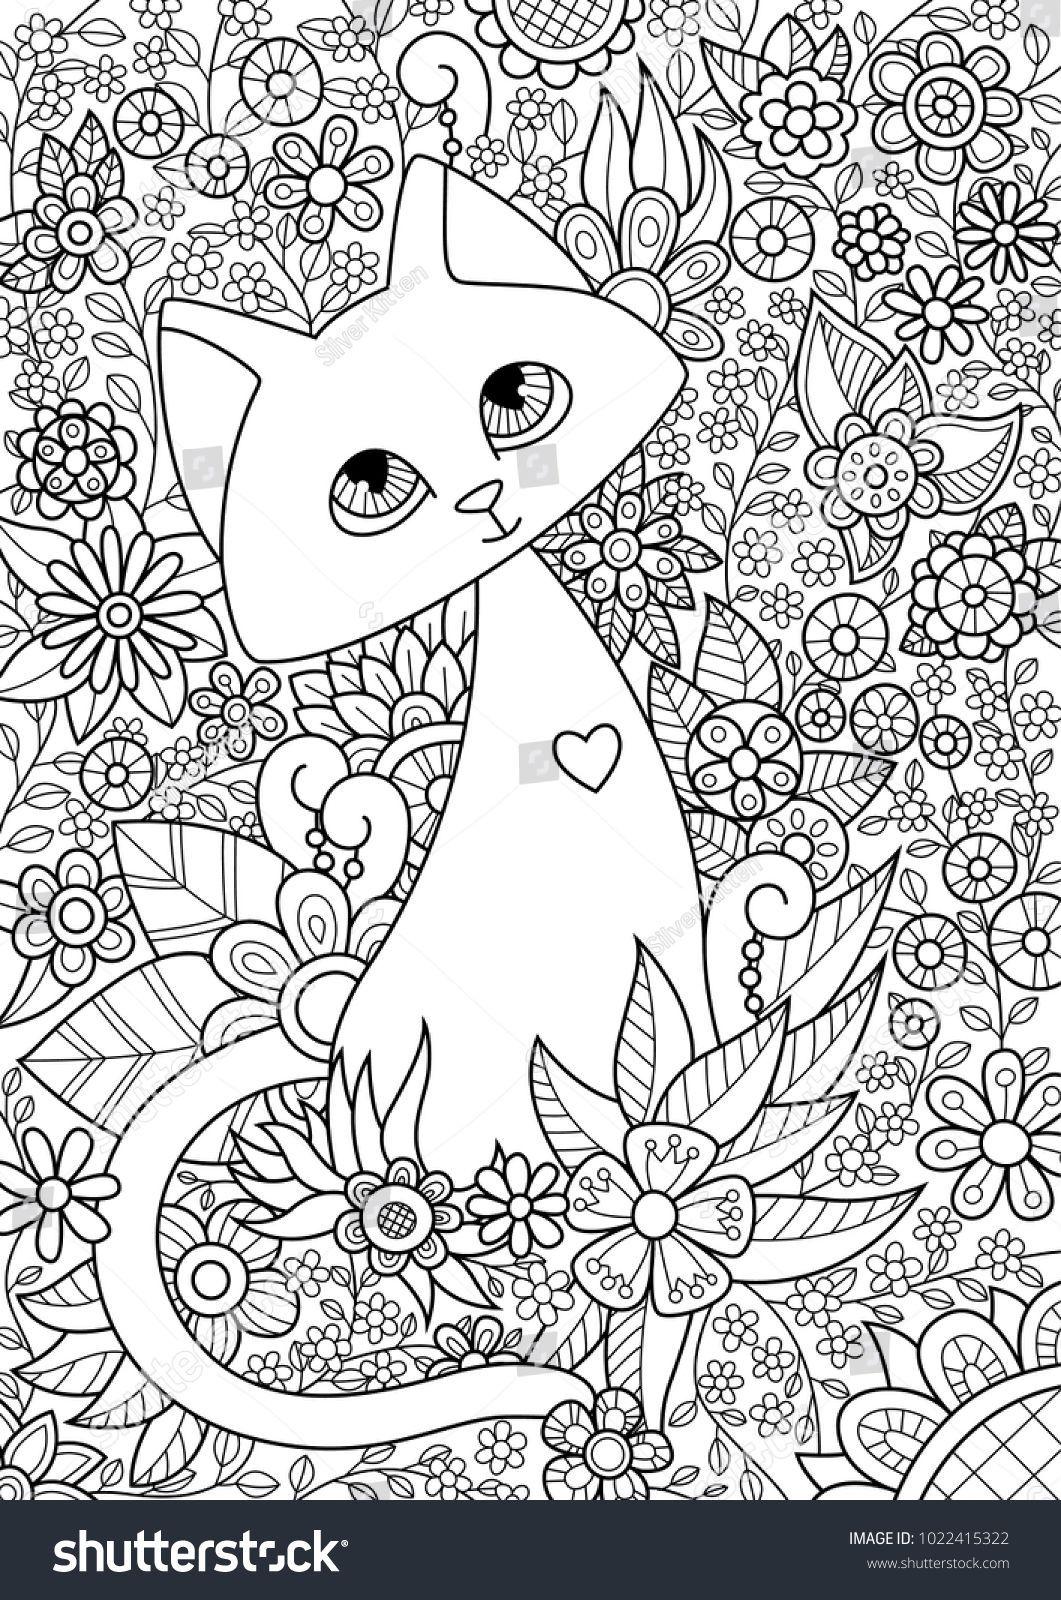 90d18aaff98d8d7983ebd9df1256d416.jpg (1061×1600)   Doodle ...